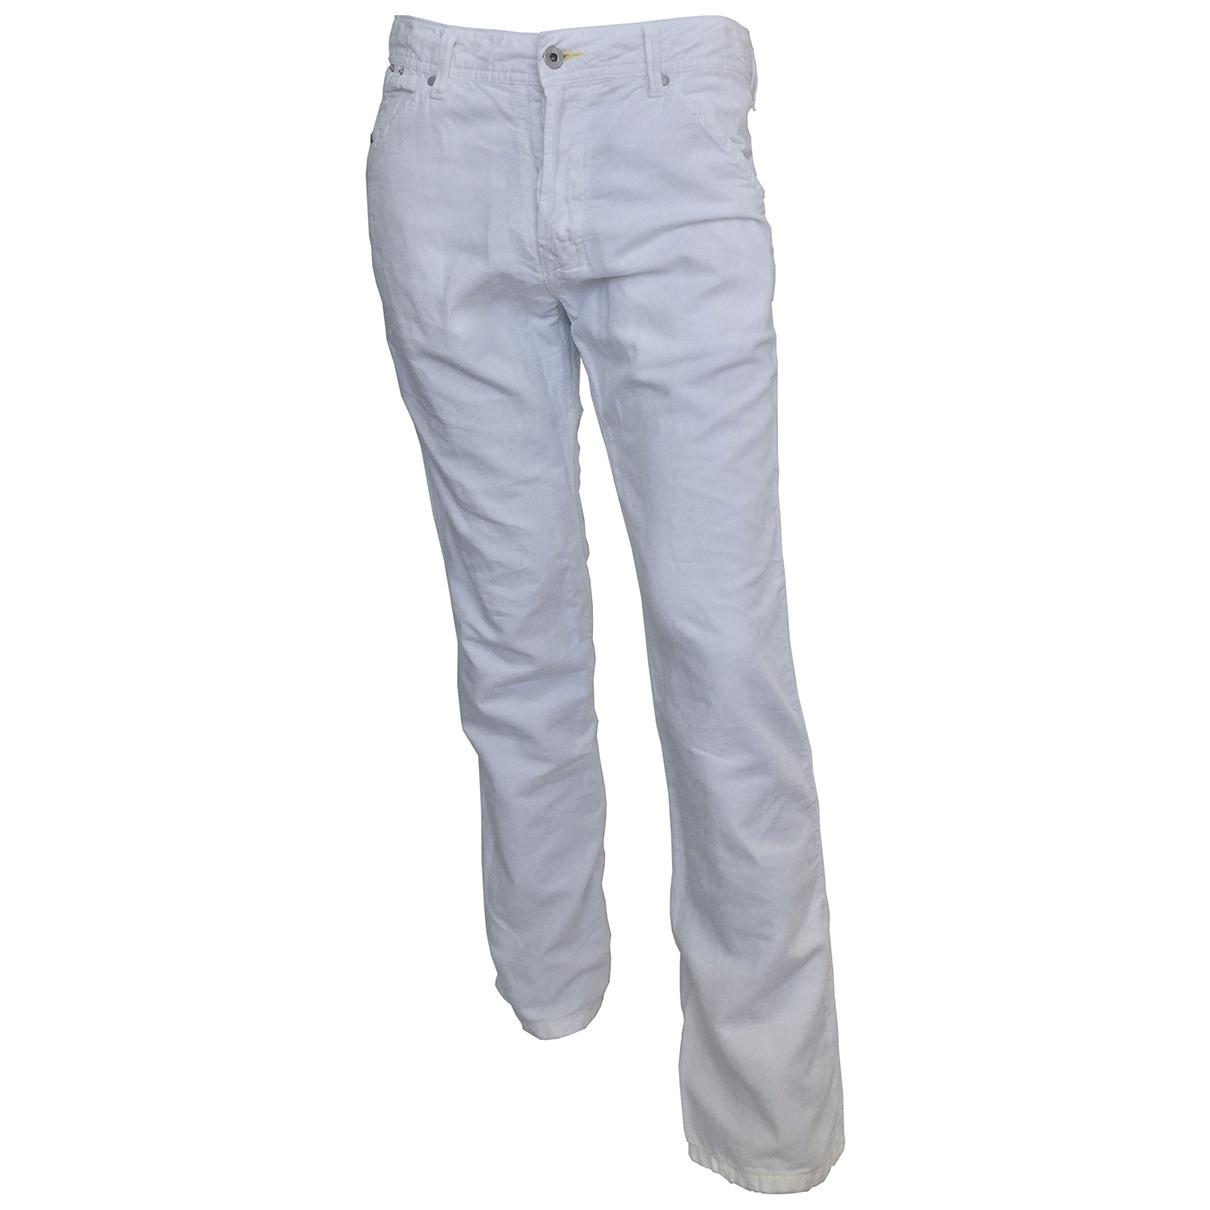 Diesel \N White Cotton Jeans for Men 30 US